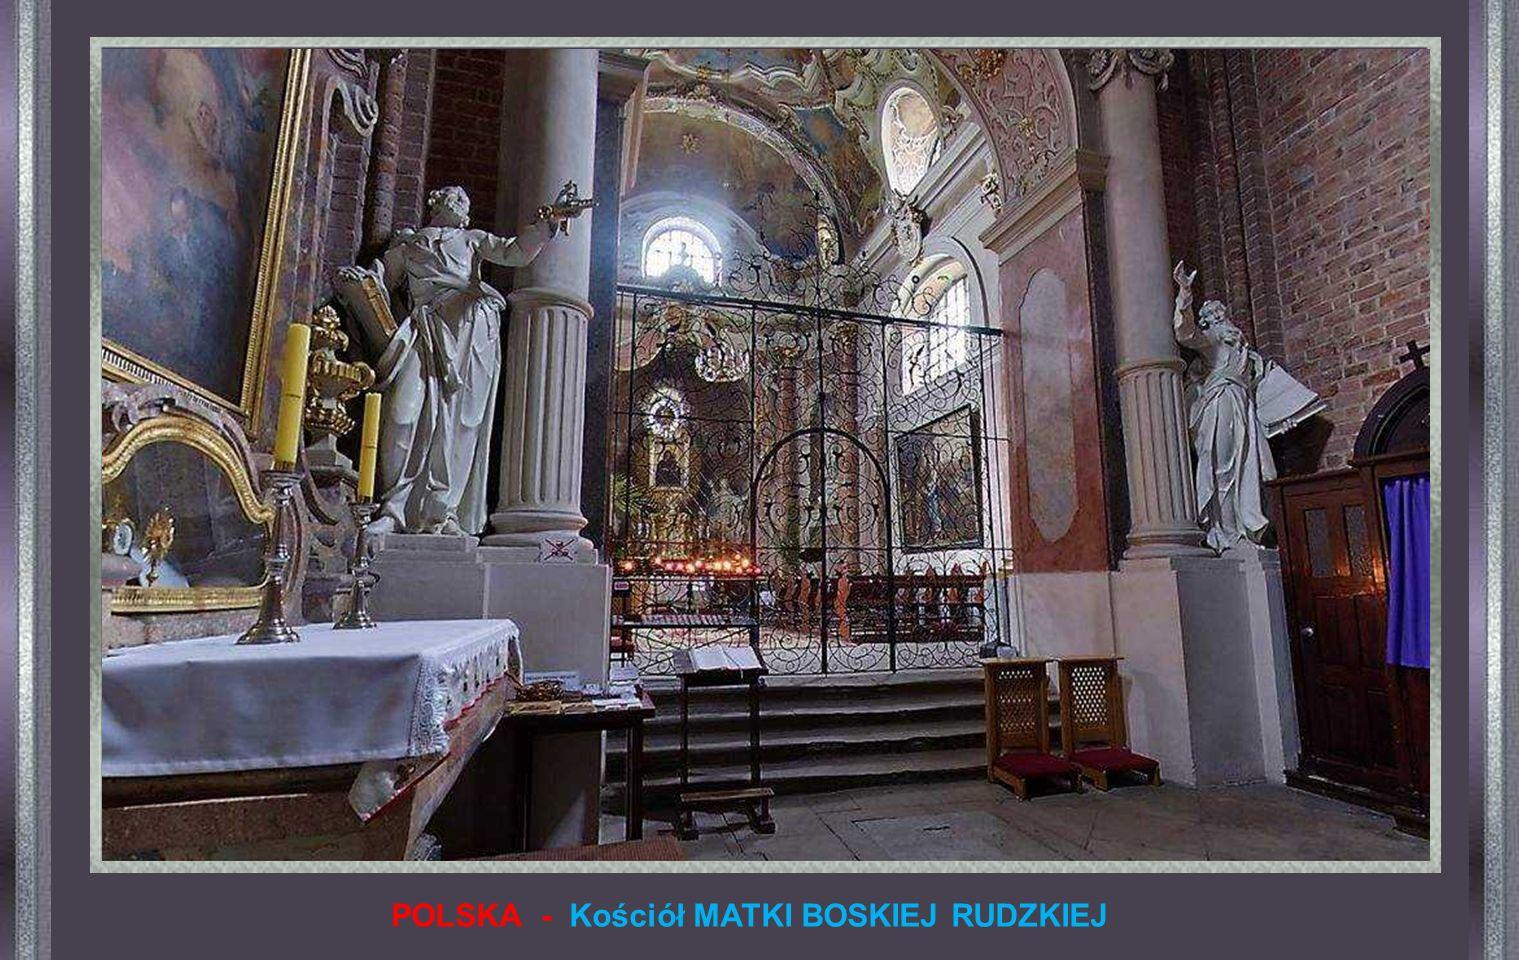 POLSKA - Kościół MATKI BOSKIEJ RUDZKIEJ